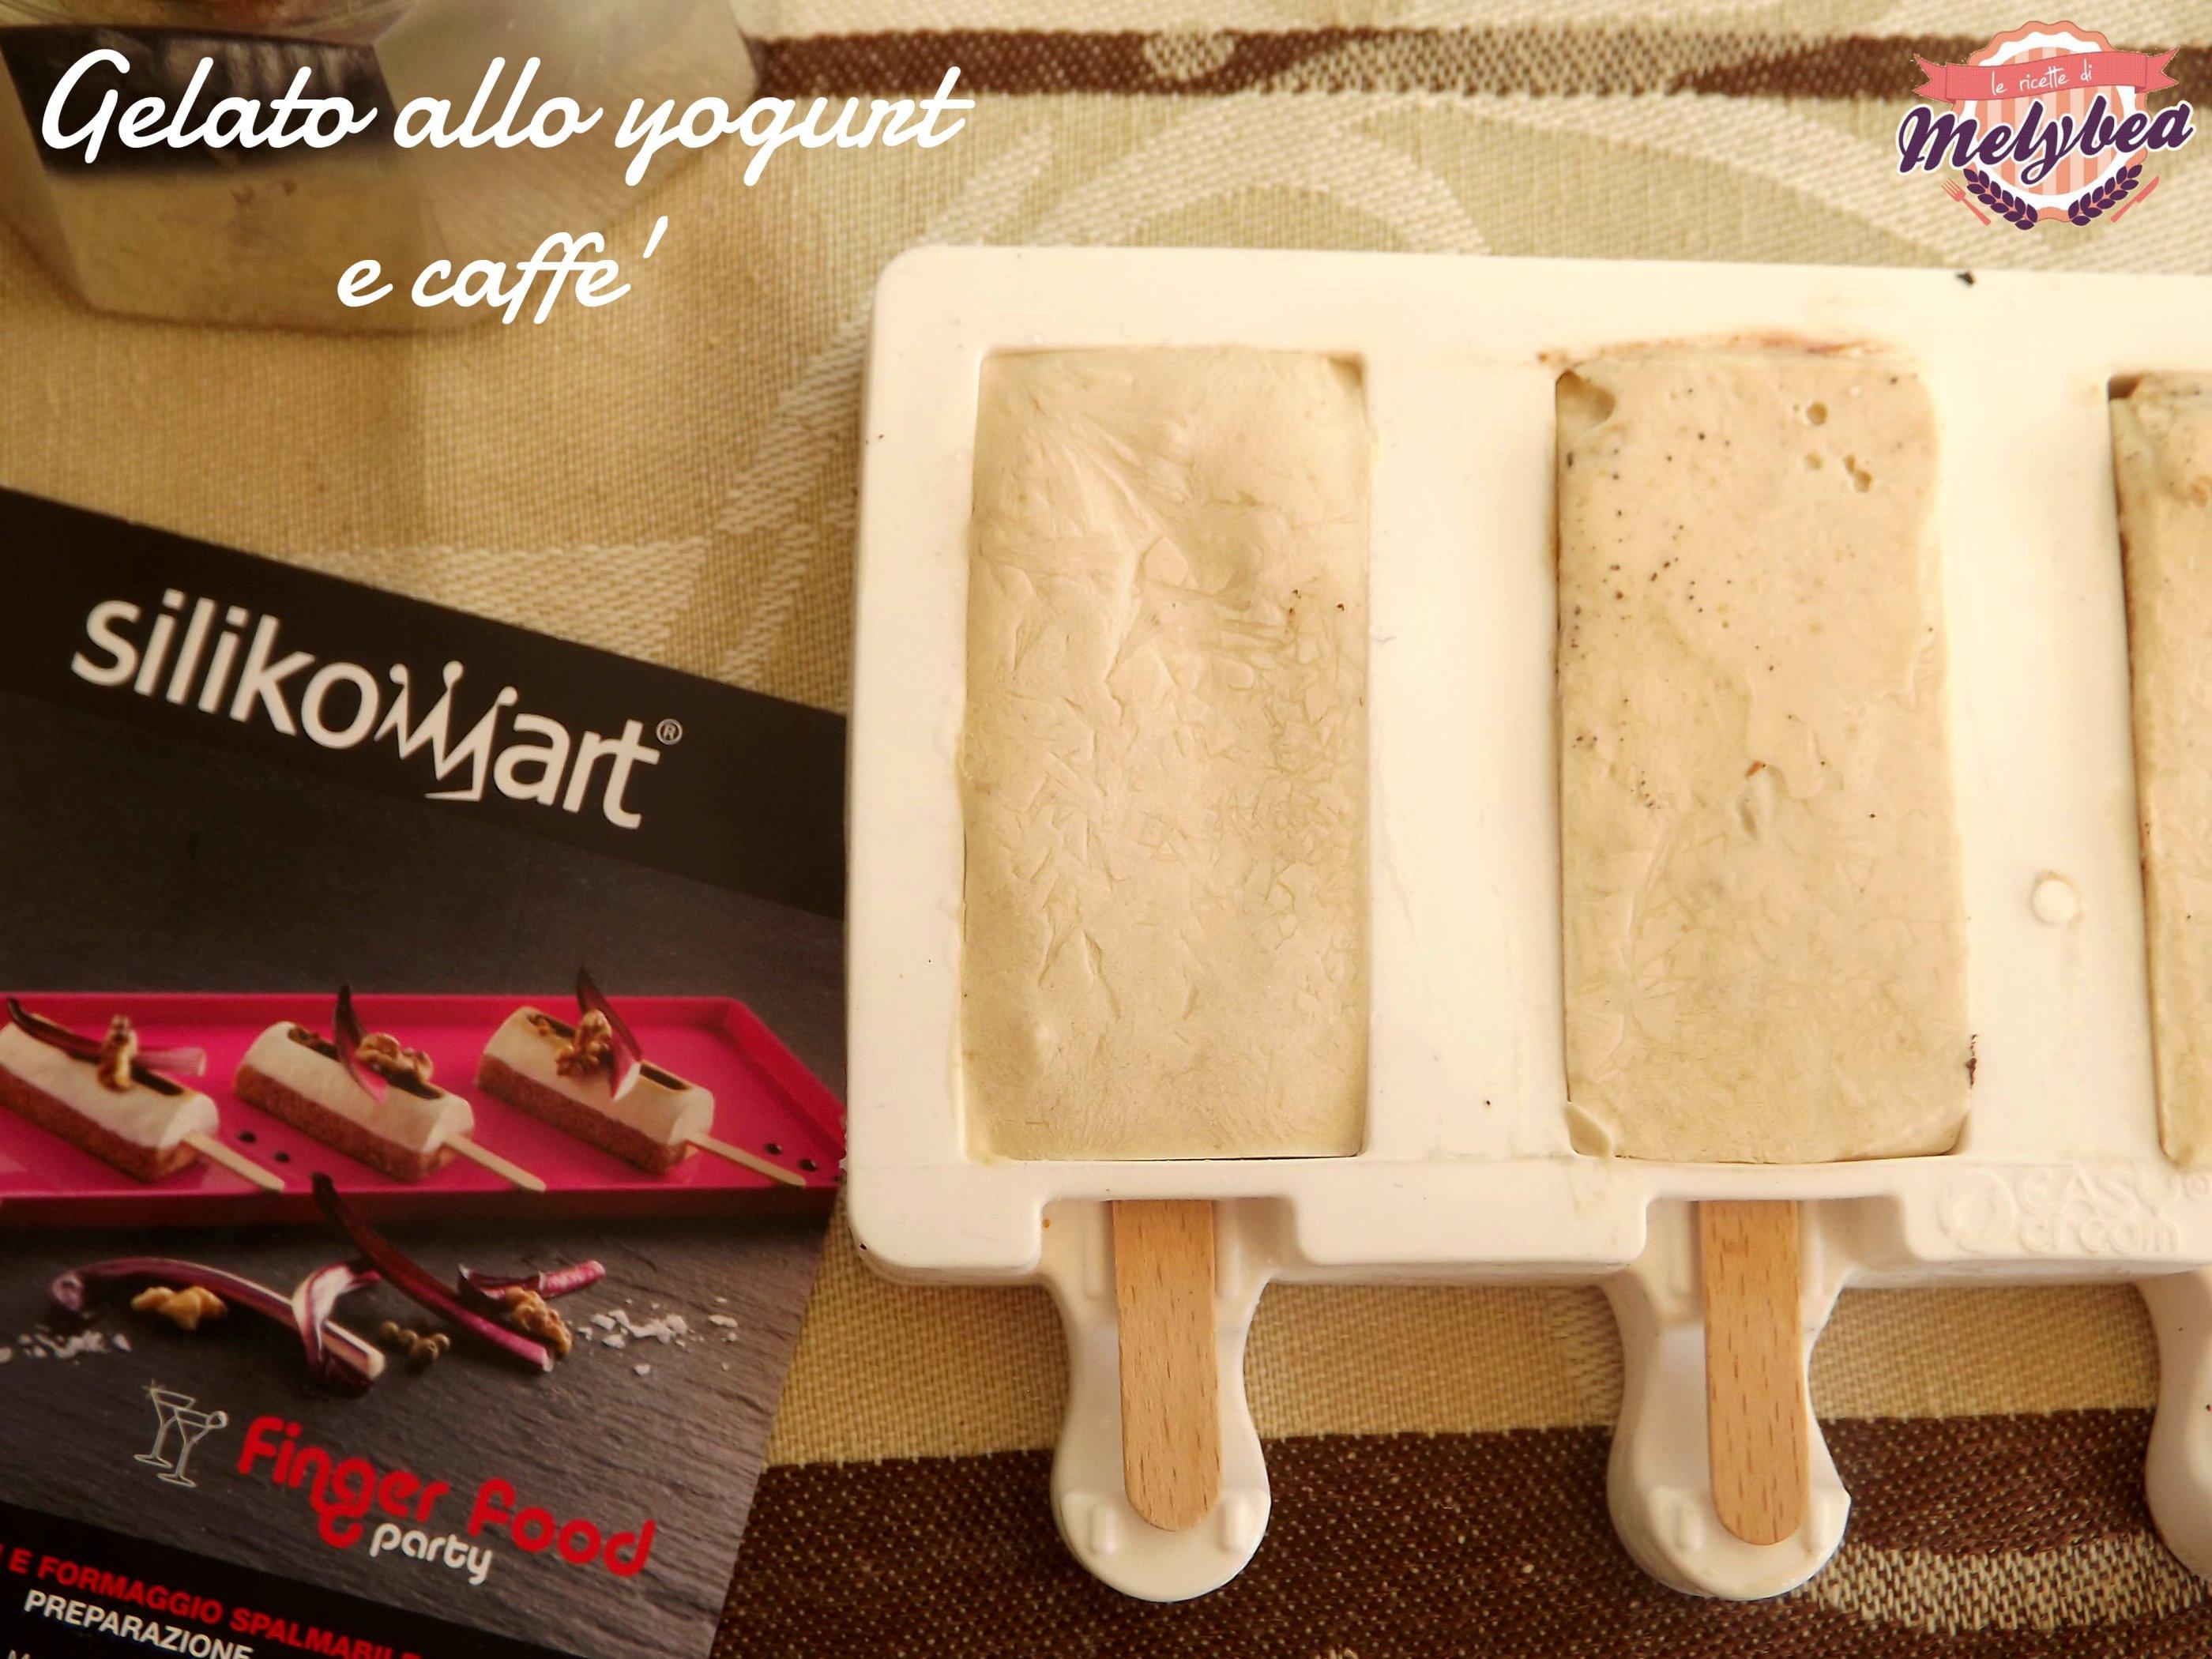 gelato allp yogurt e caffè silikomart